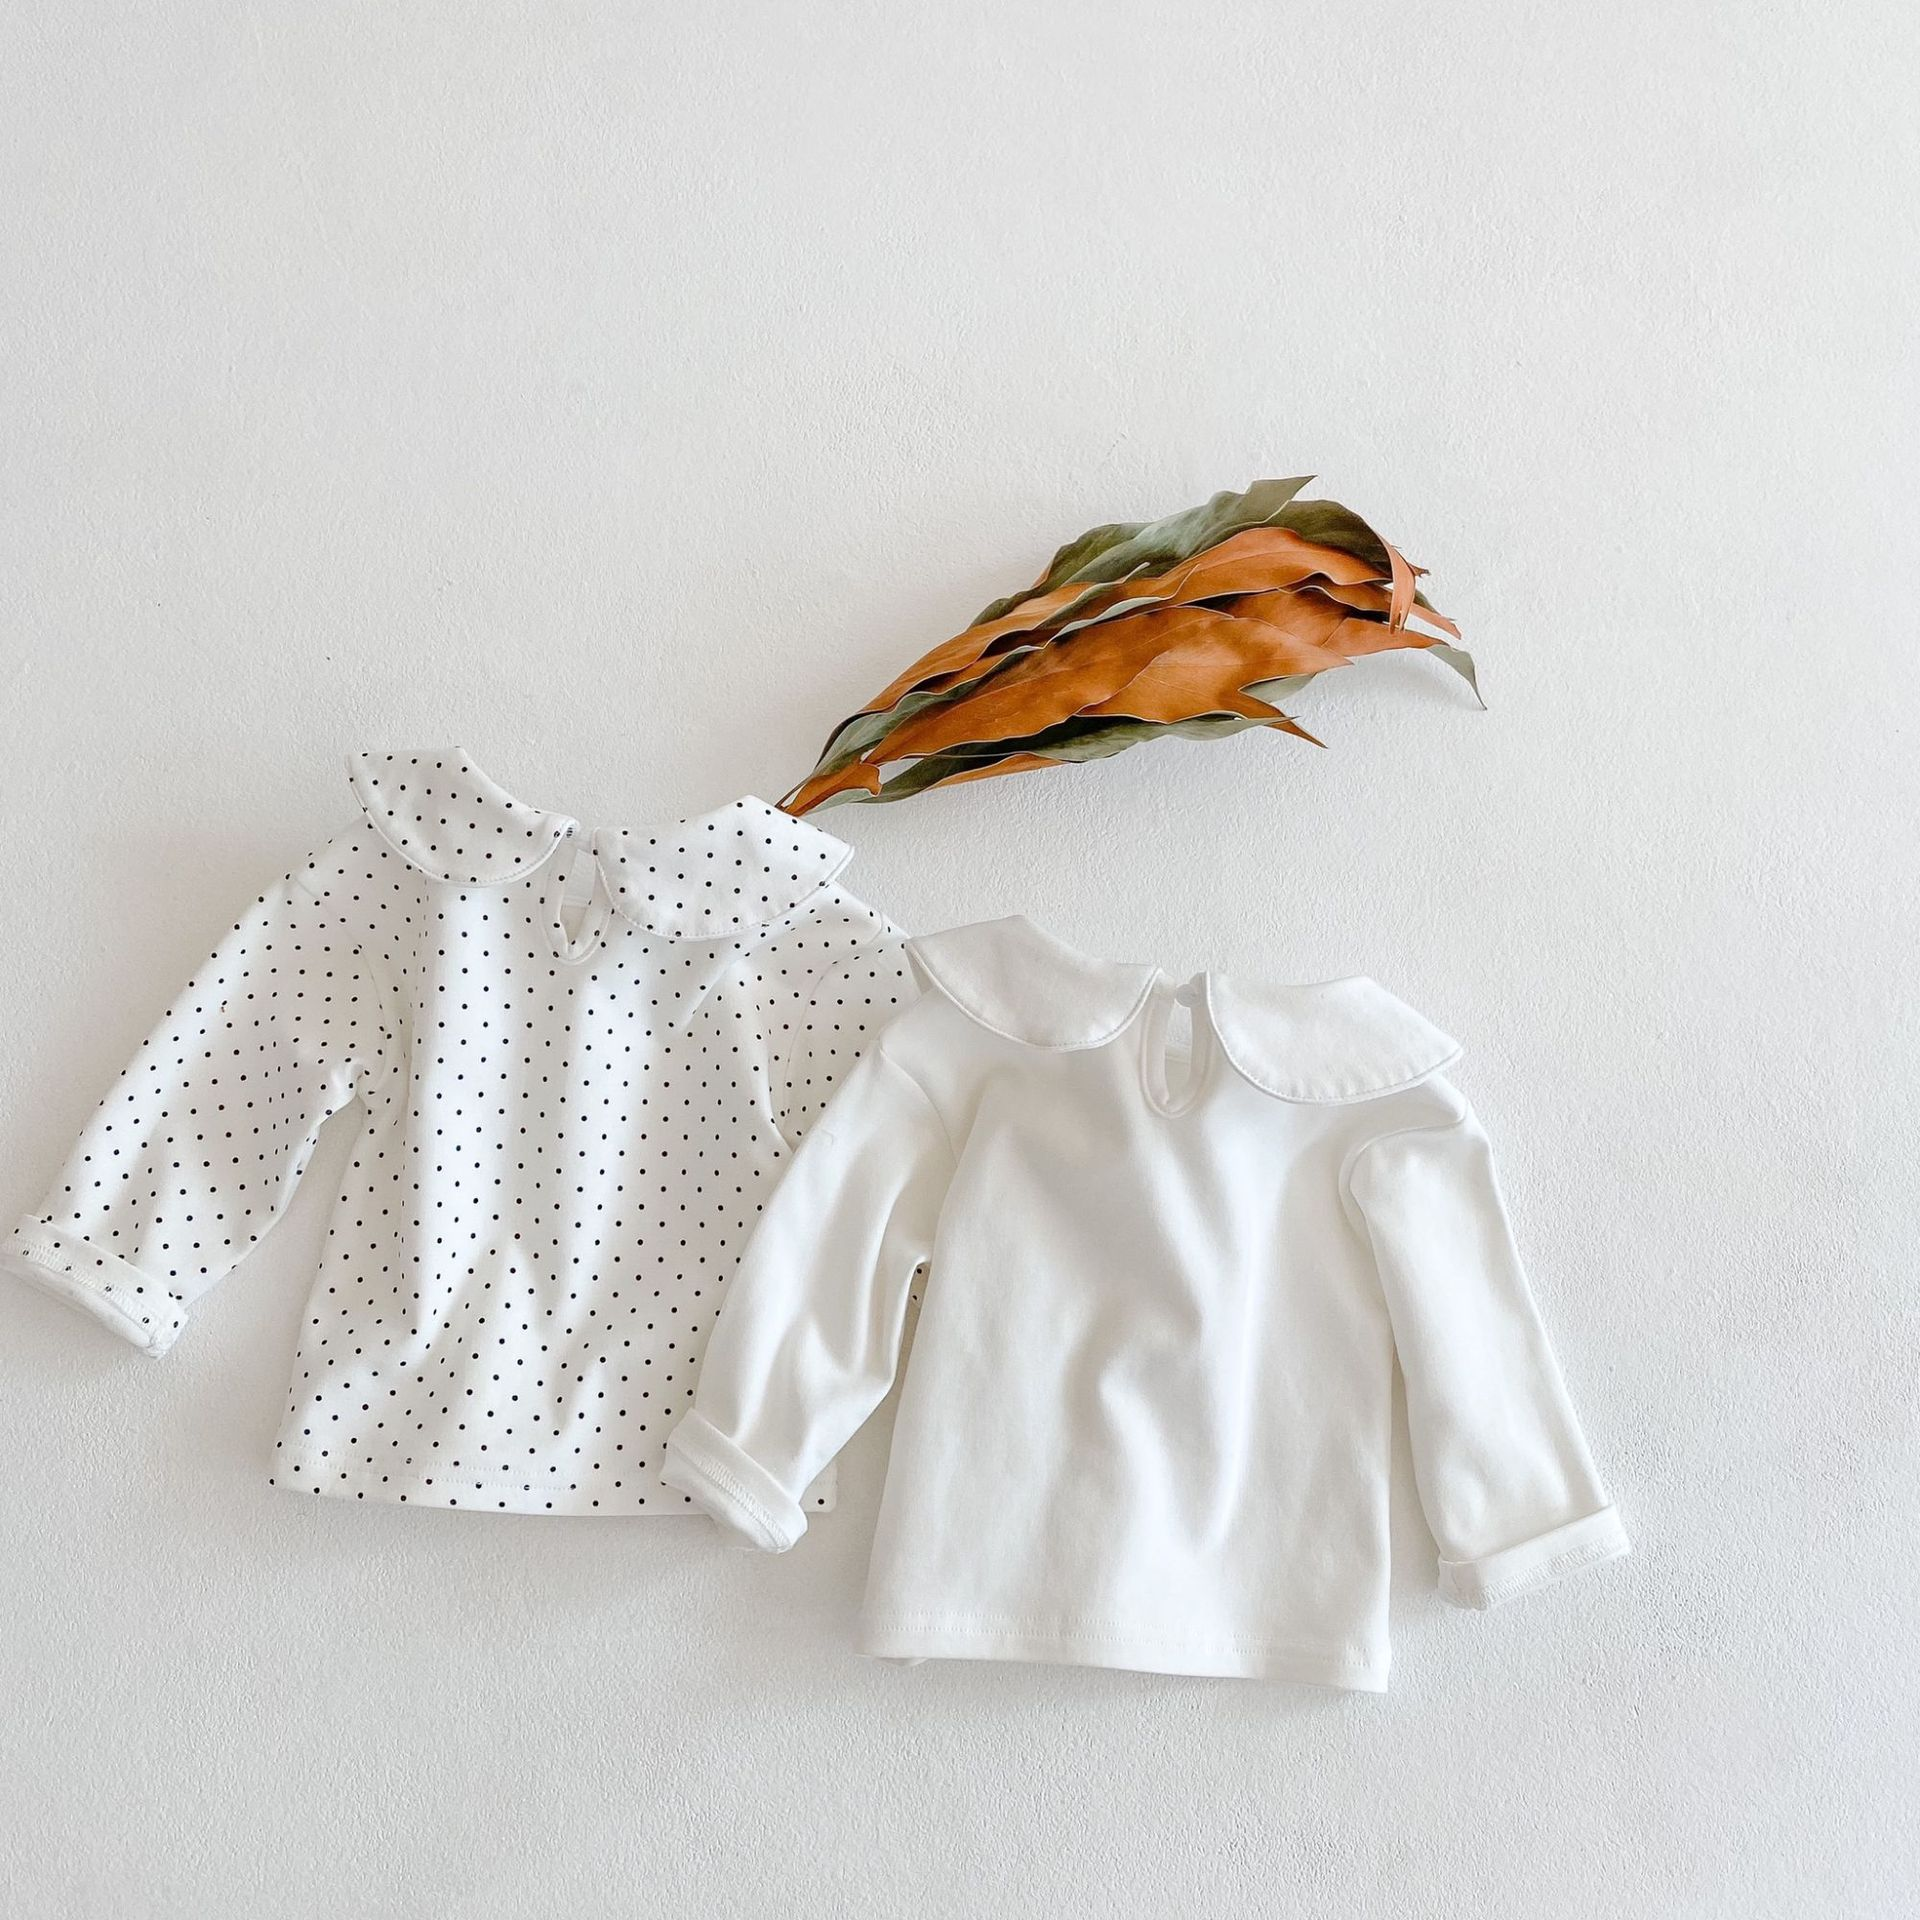 Baby Girls Basic Shirt Long Sleeve Toddler Polka Dot White Tops Spring Autumn 0-3Y